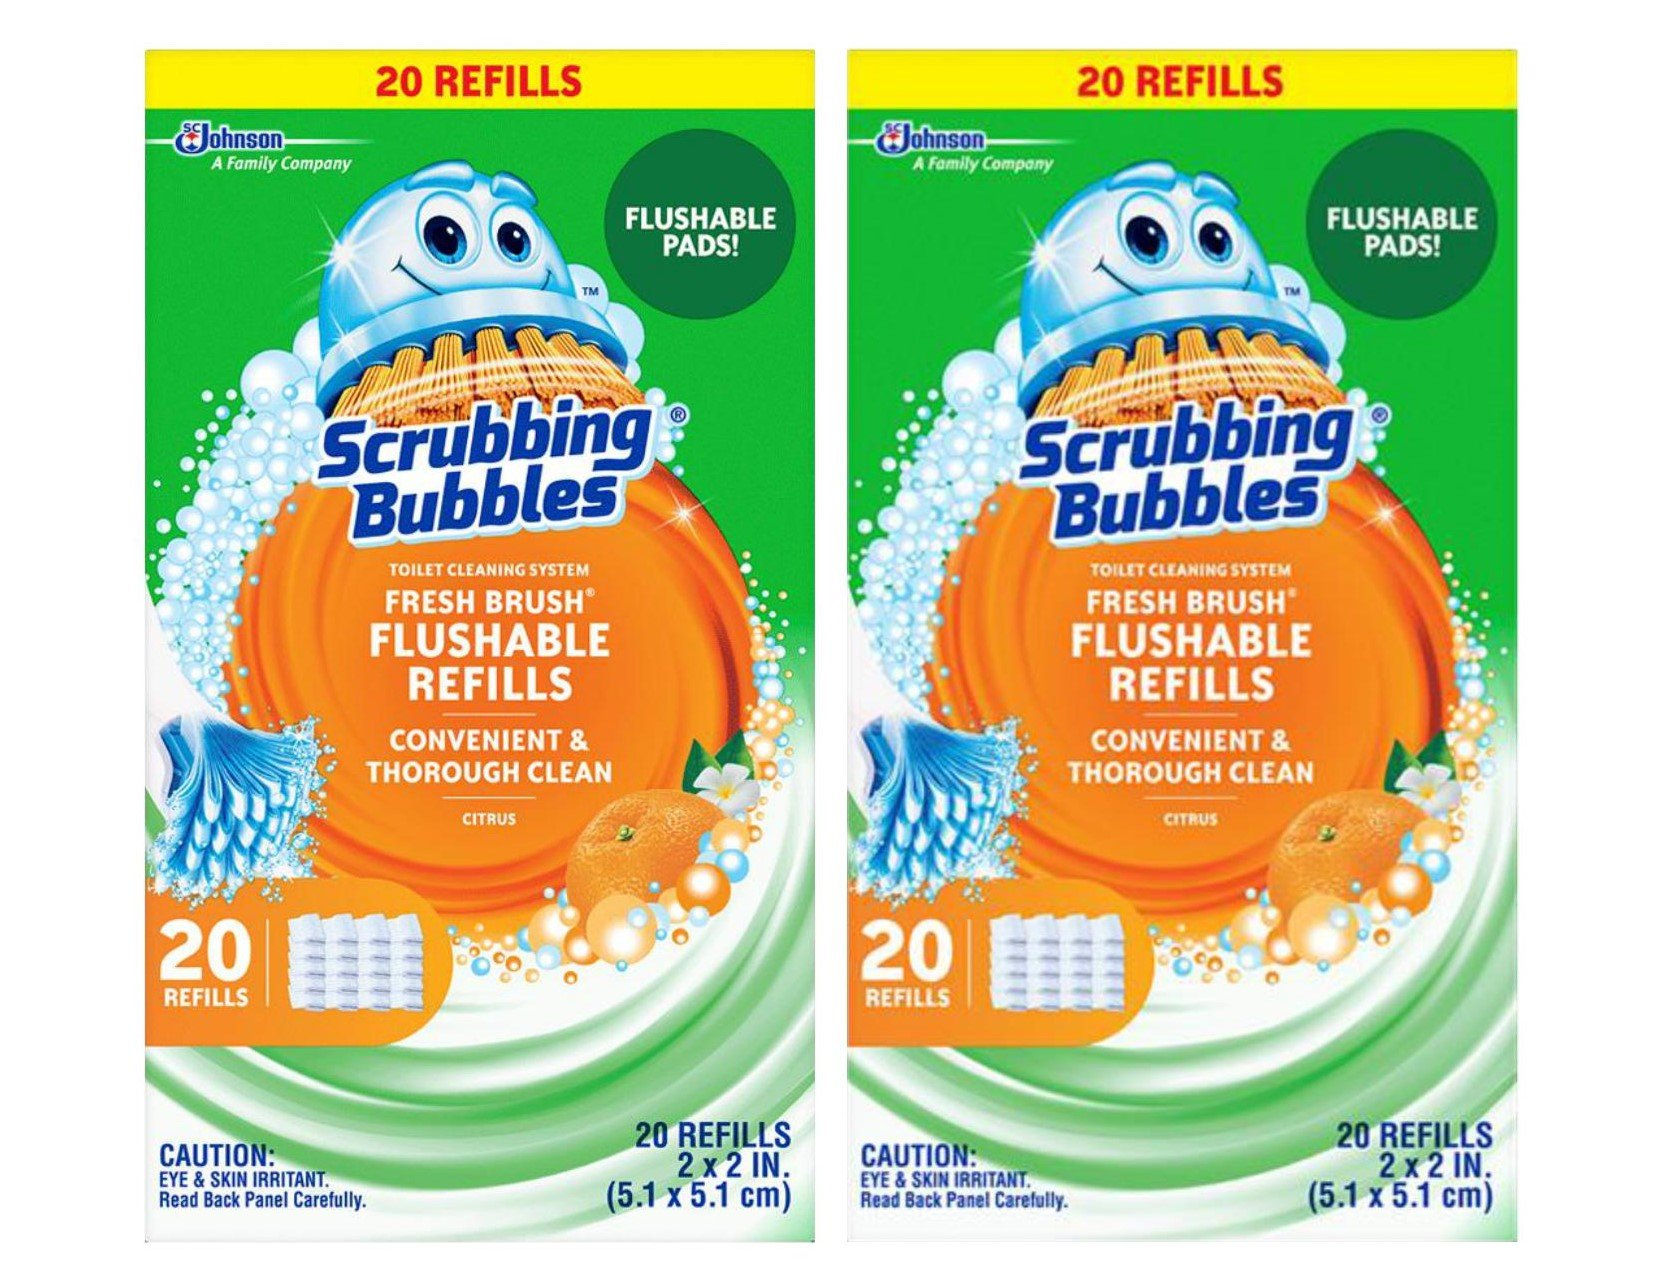 Scrubbing Bubbles Toilet Fresh Brush Flushable Refills 20 CT (Pack of 2)